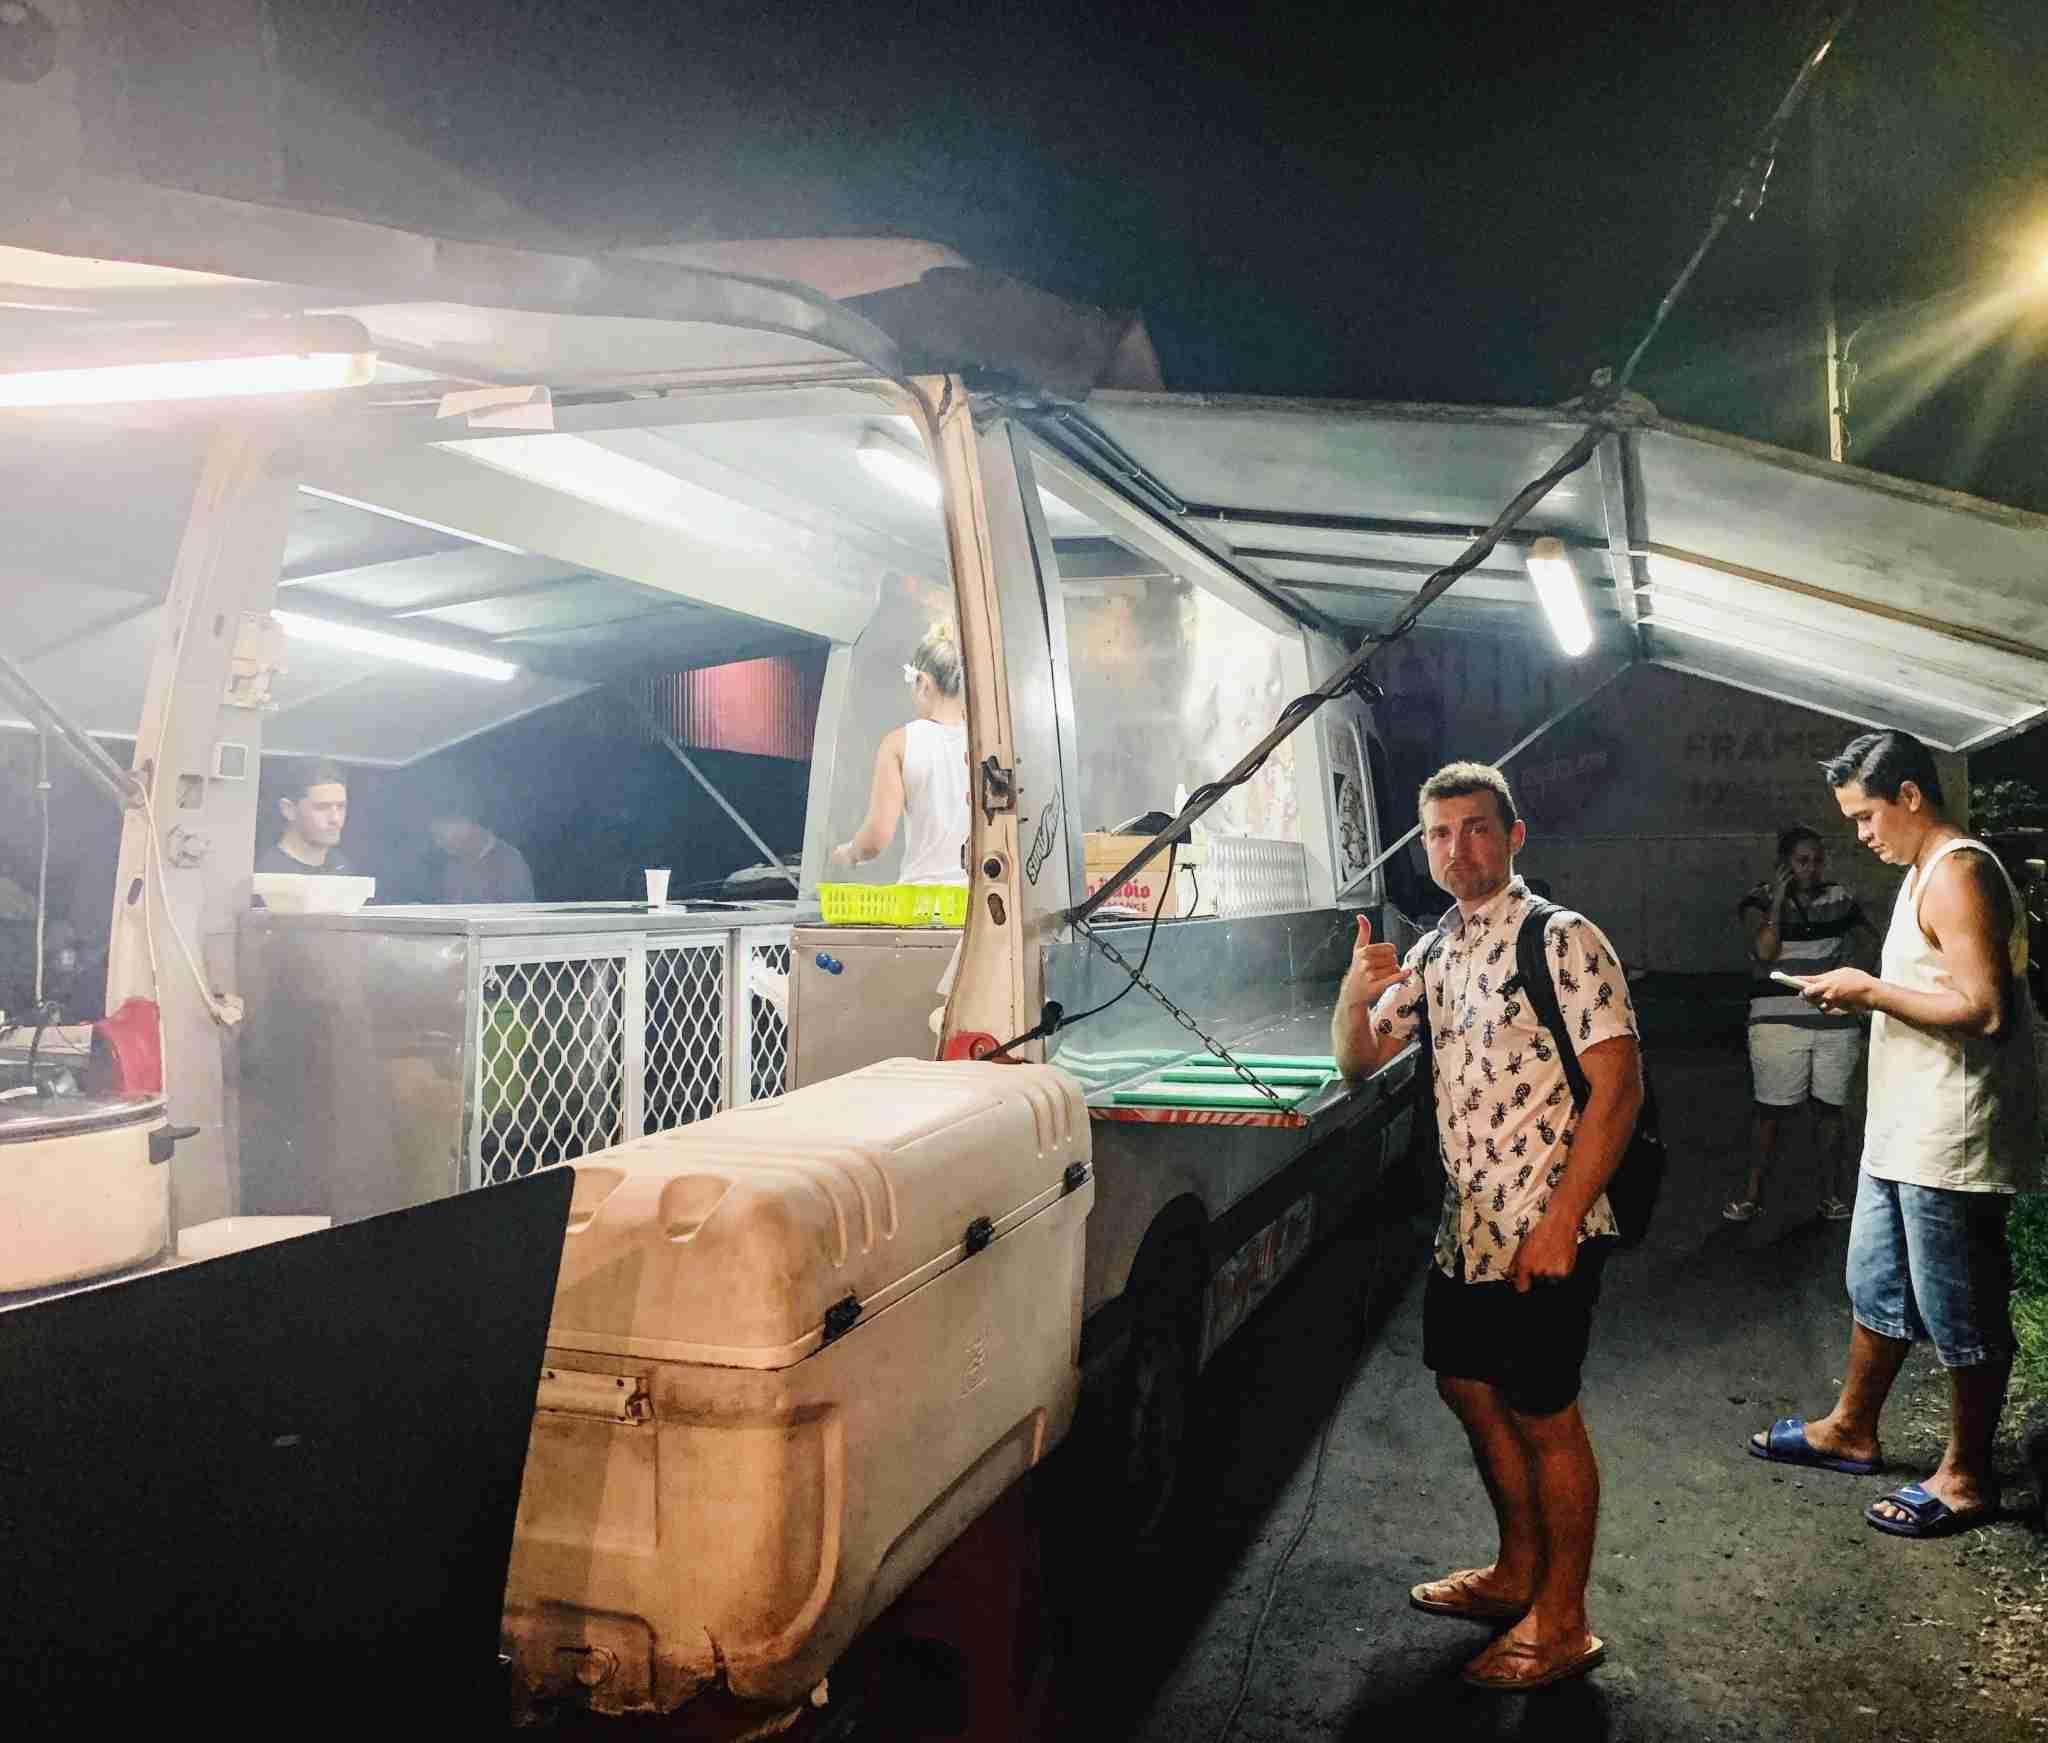 tahiti food truck crepe